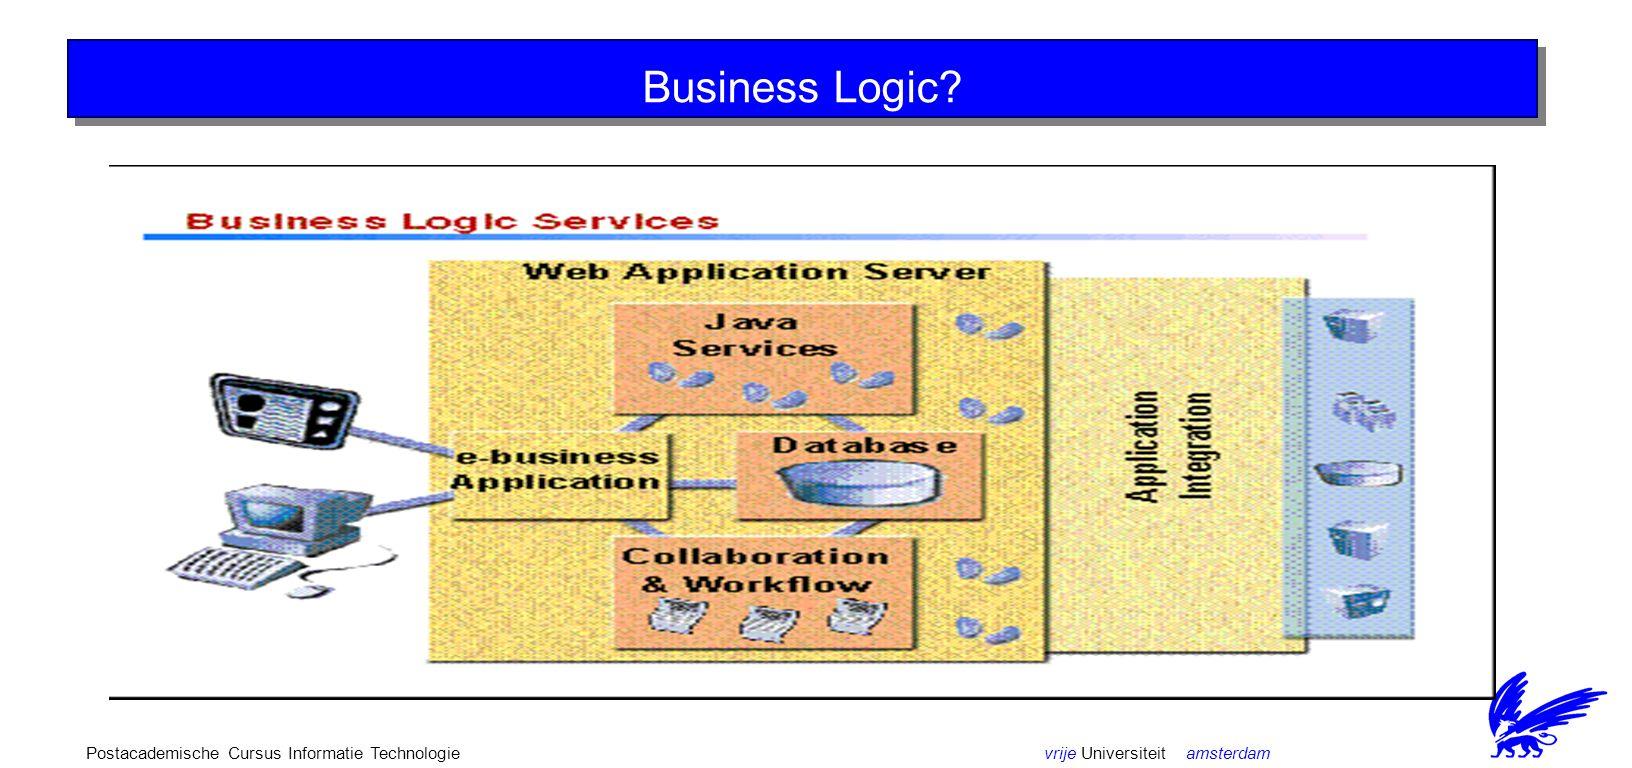 vrije Universiteit amsterdamPostacademische Cursus Informatie Technologie Business Logic